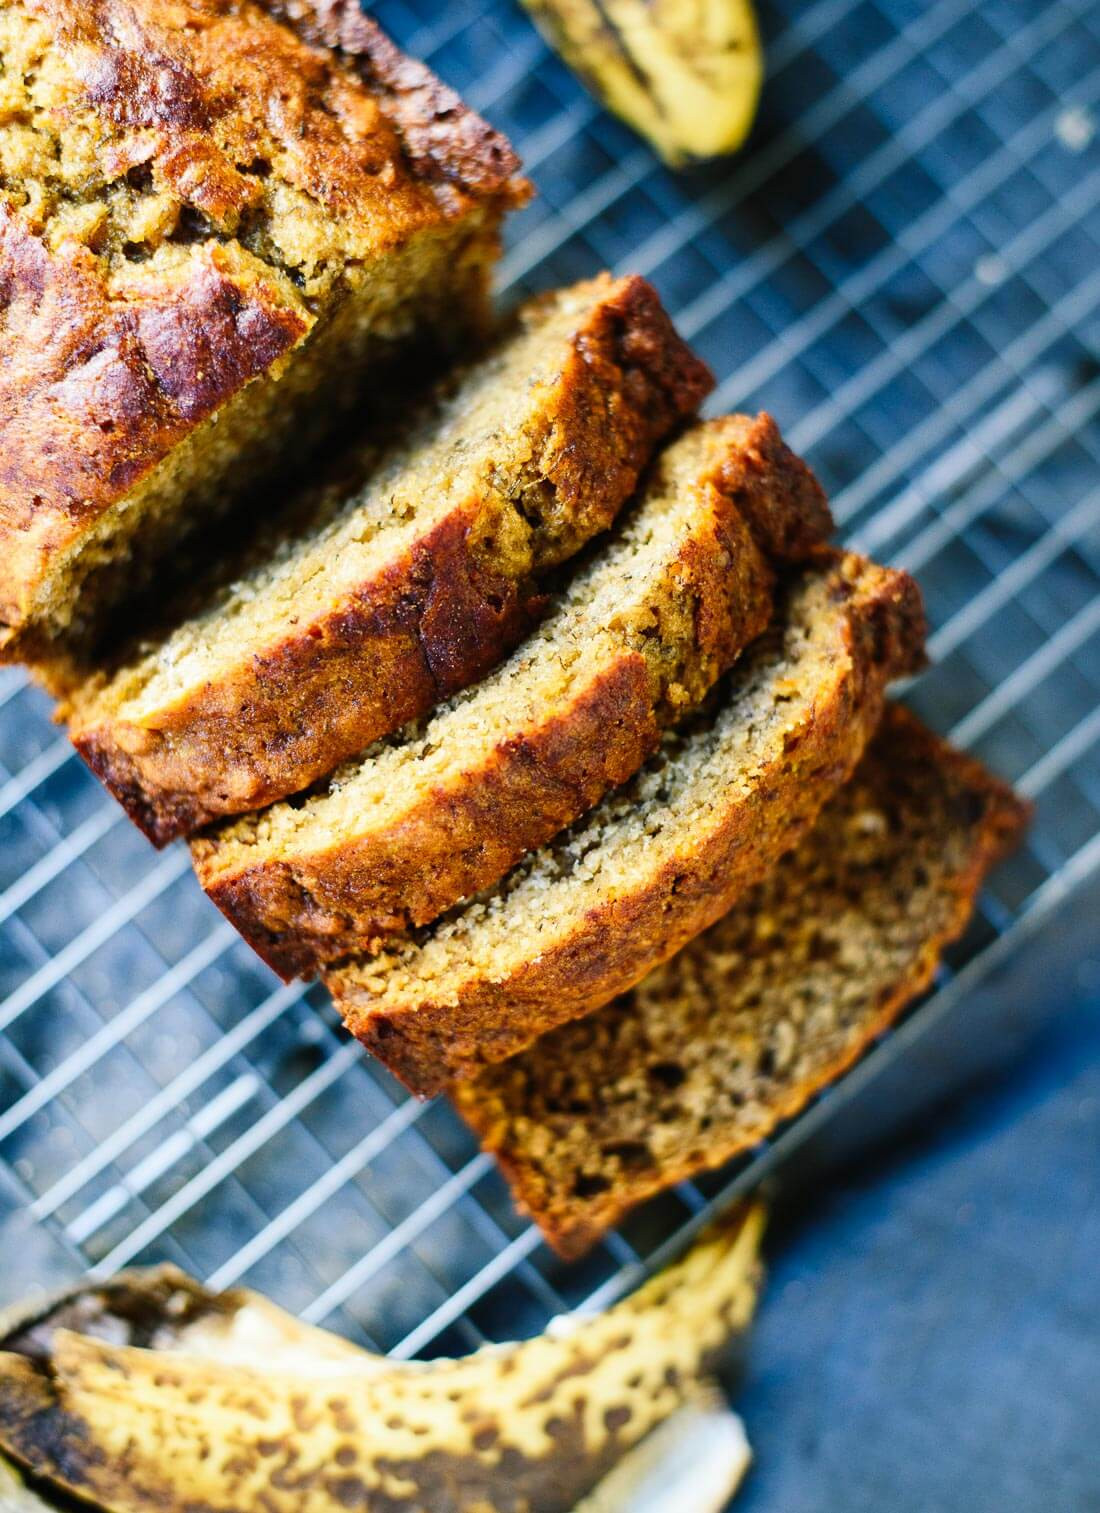 Healthy Bake Bread  Healthy Banana Bread Recipe Cookie and Kate